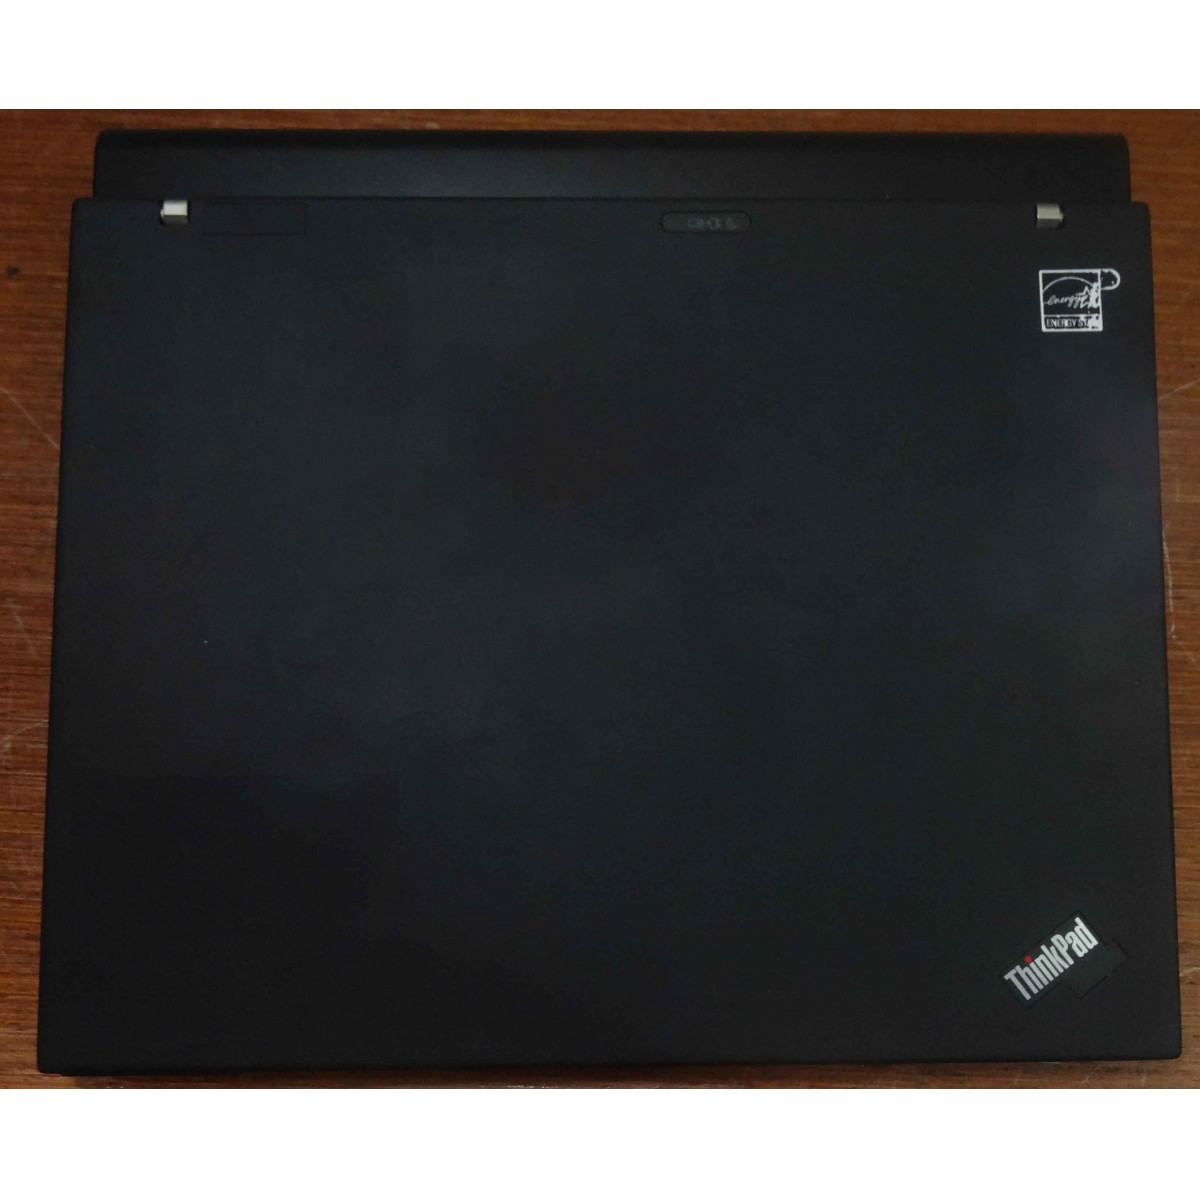 Notebook Lenovo Thinkpad X615S 12.1'' Intel Core 2 Duo 1.6GHz 3GB HD-100GB